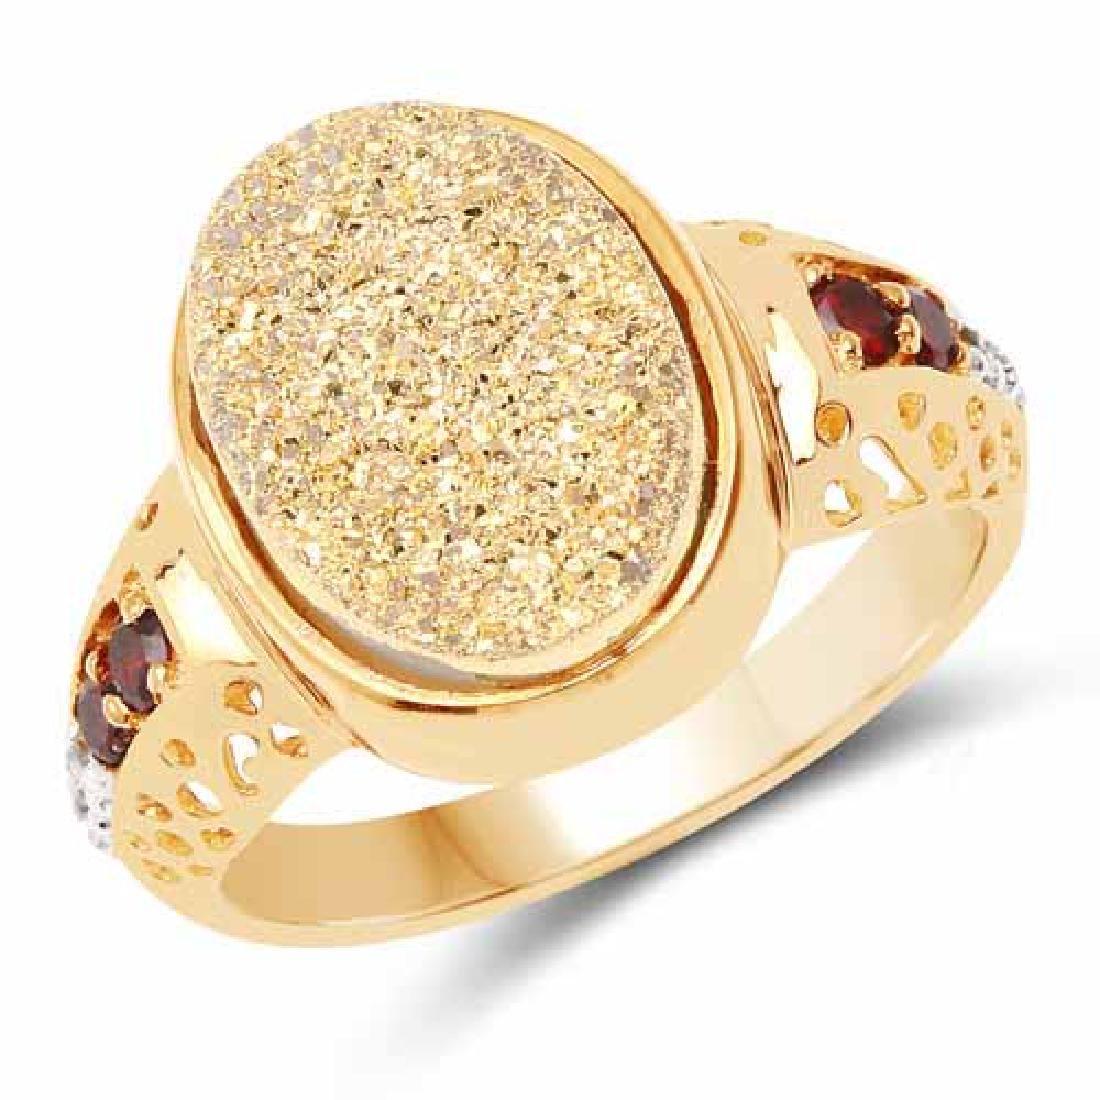 14K Yellow Gold Plated 4.71 Carat Genuine Golden Drusy